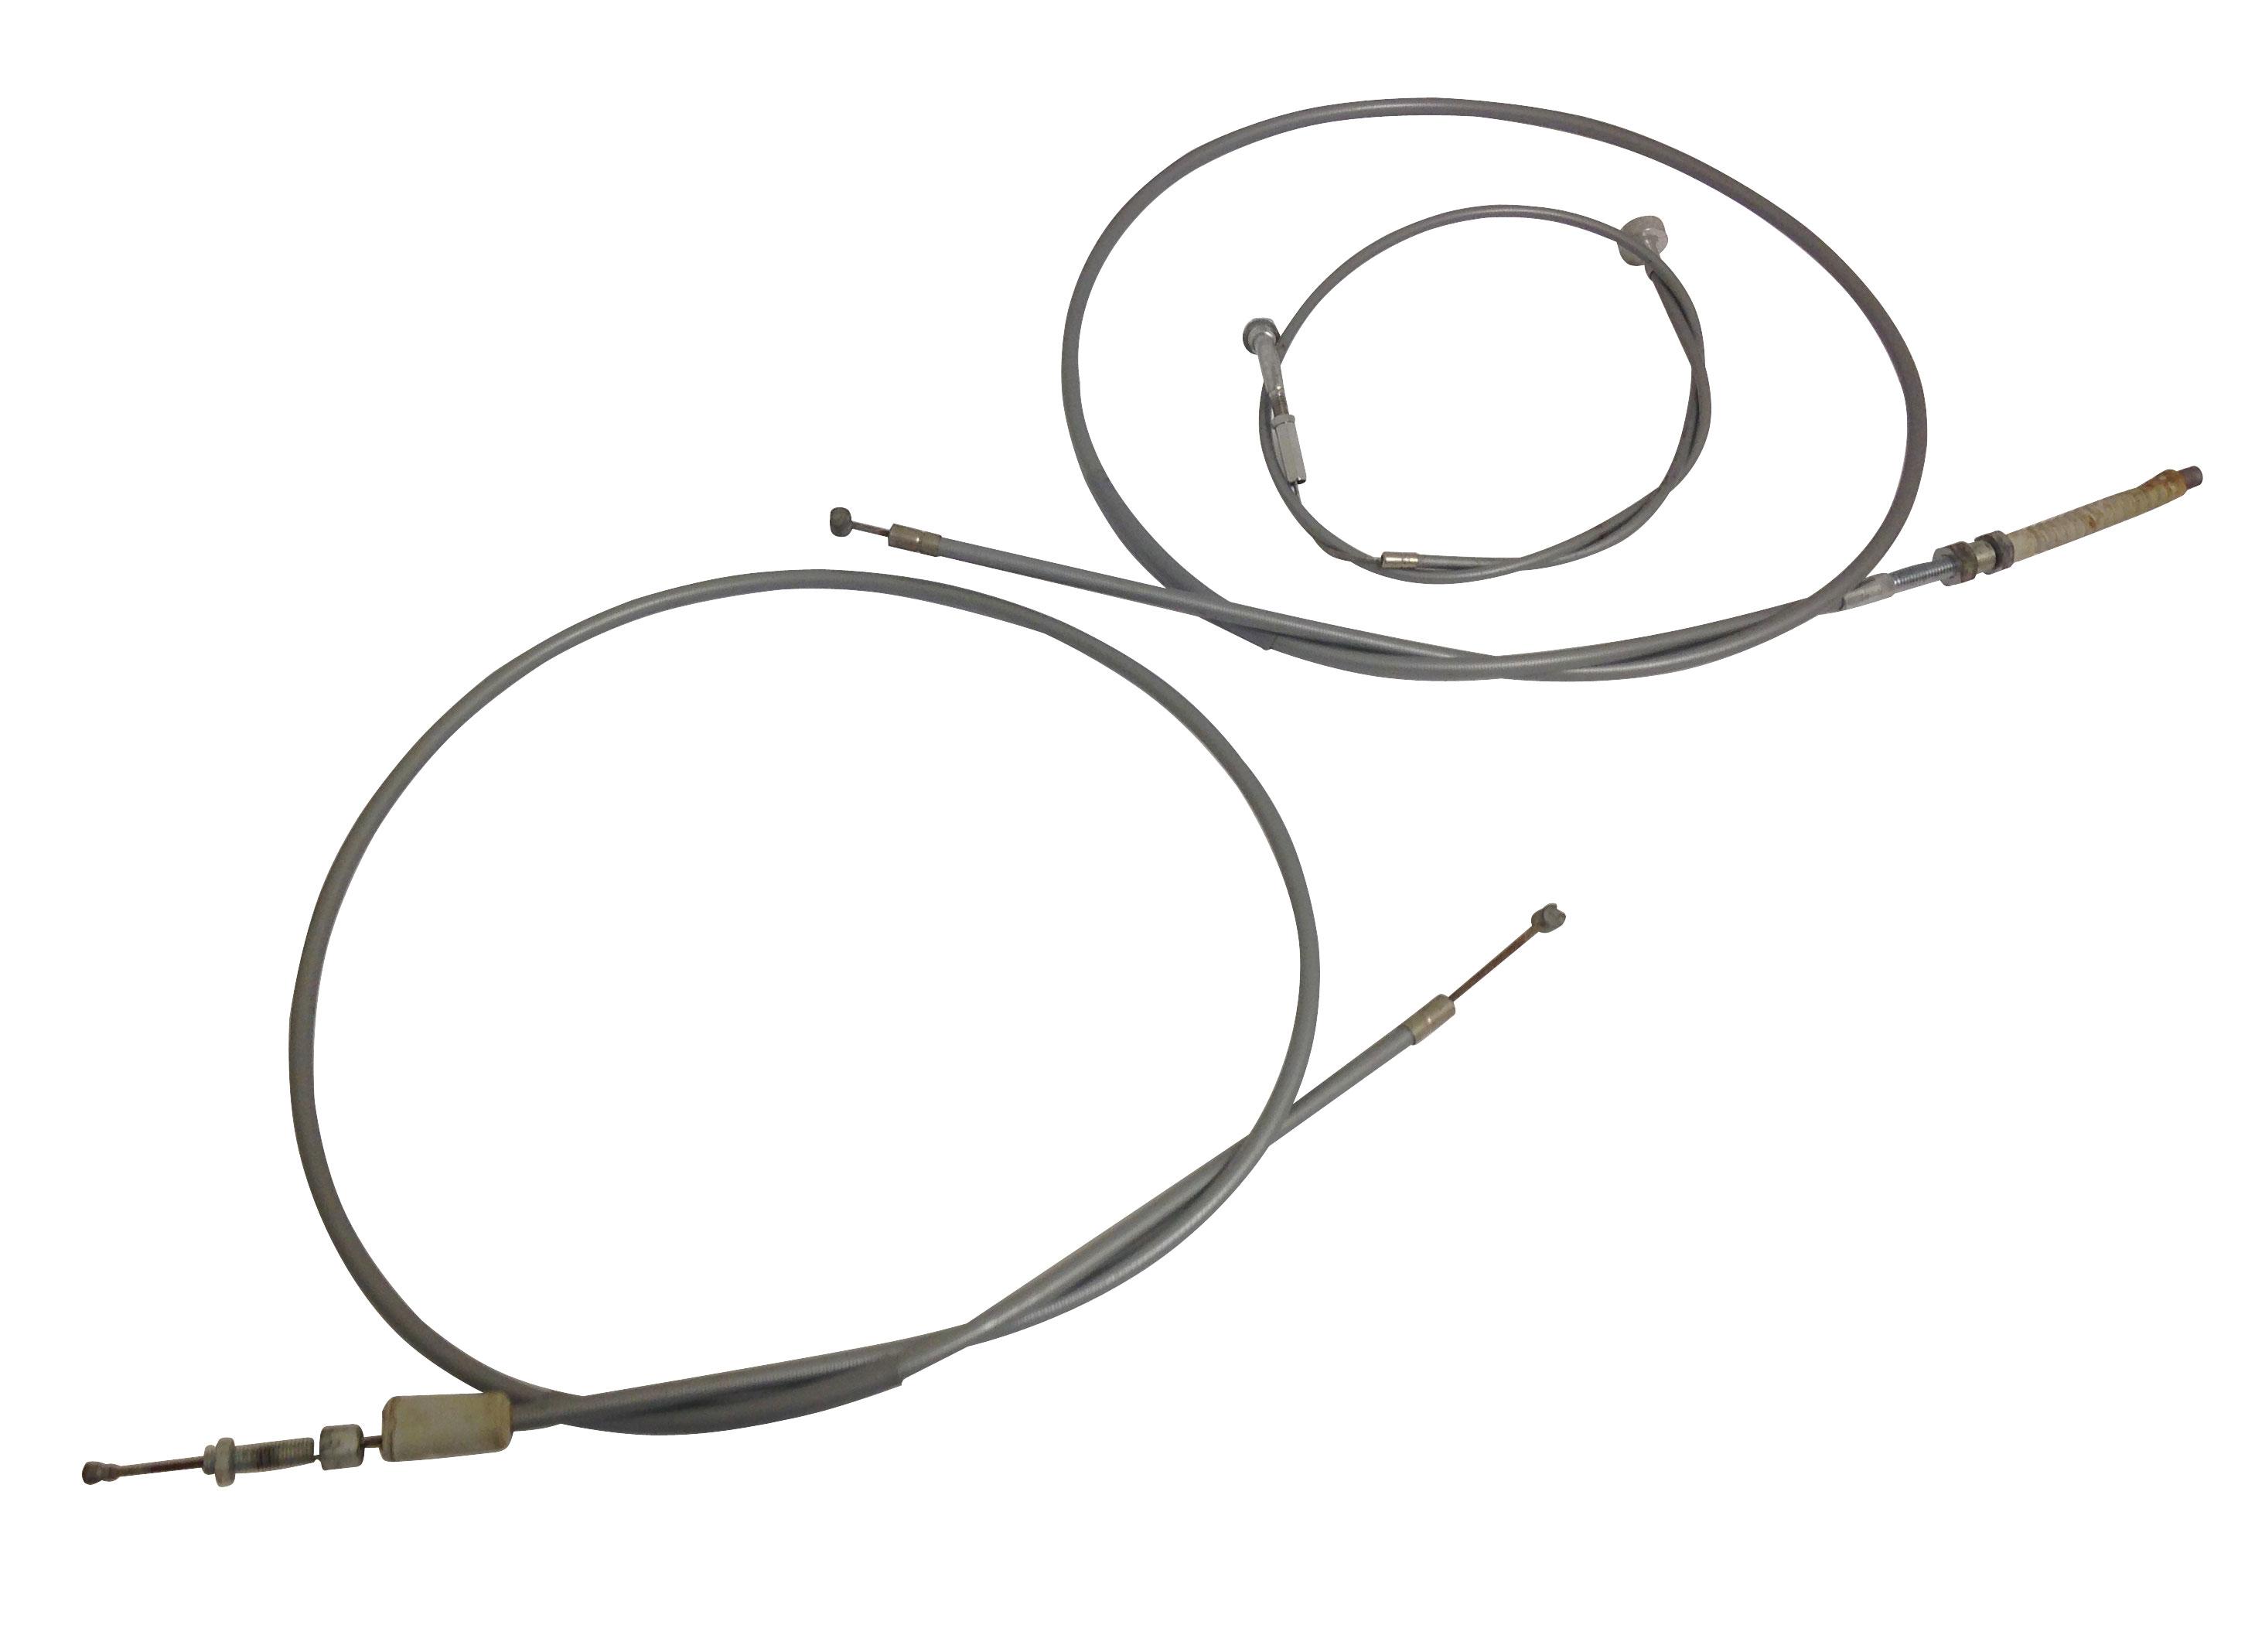 High Bar Cable Kit For Honda Cb160 Motorcycle